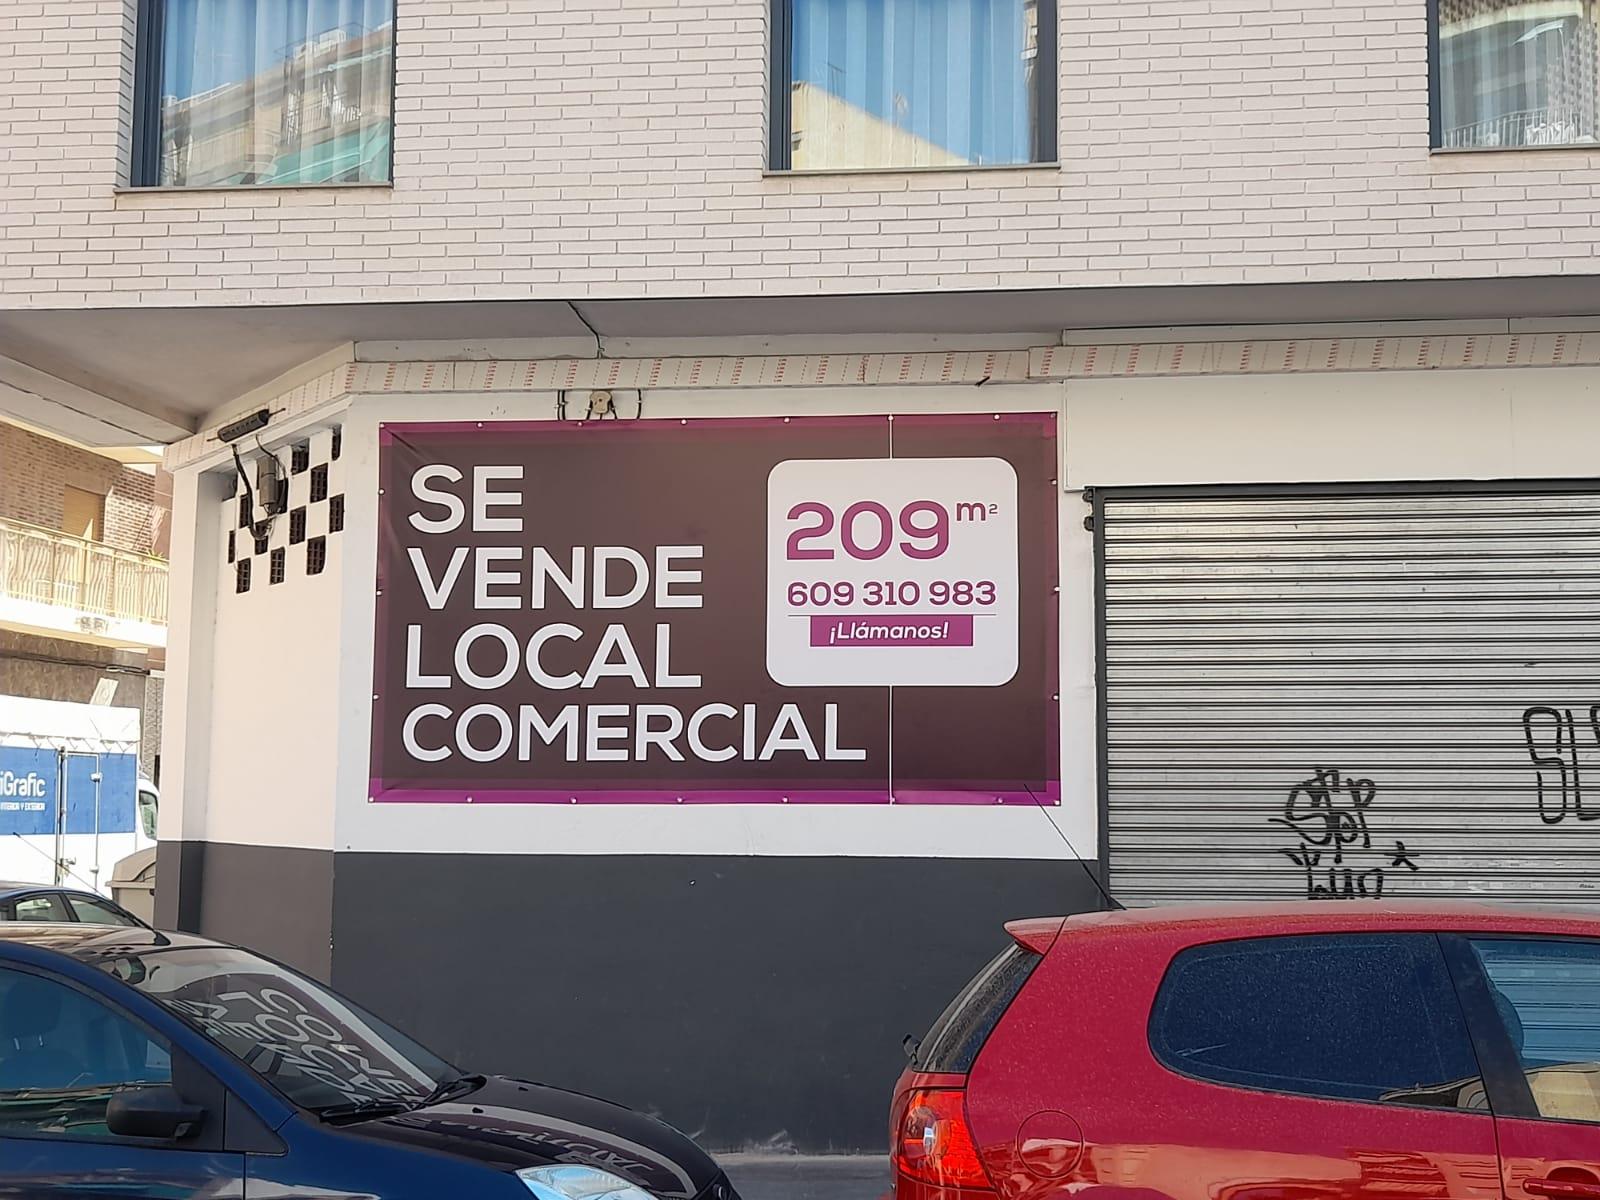 Leandro Soler Román 2, Carrús / Toscar, Elche, ,Locales Comerciales,En Venta,Leandro Soler Román,1023